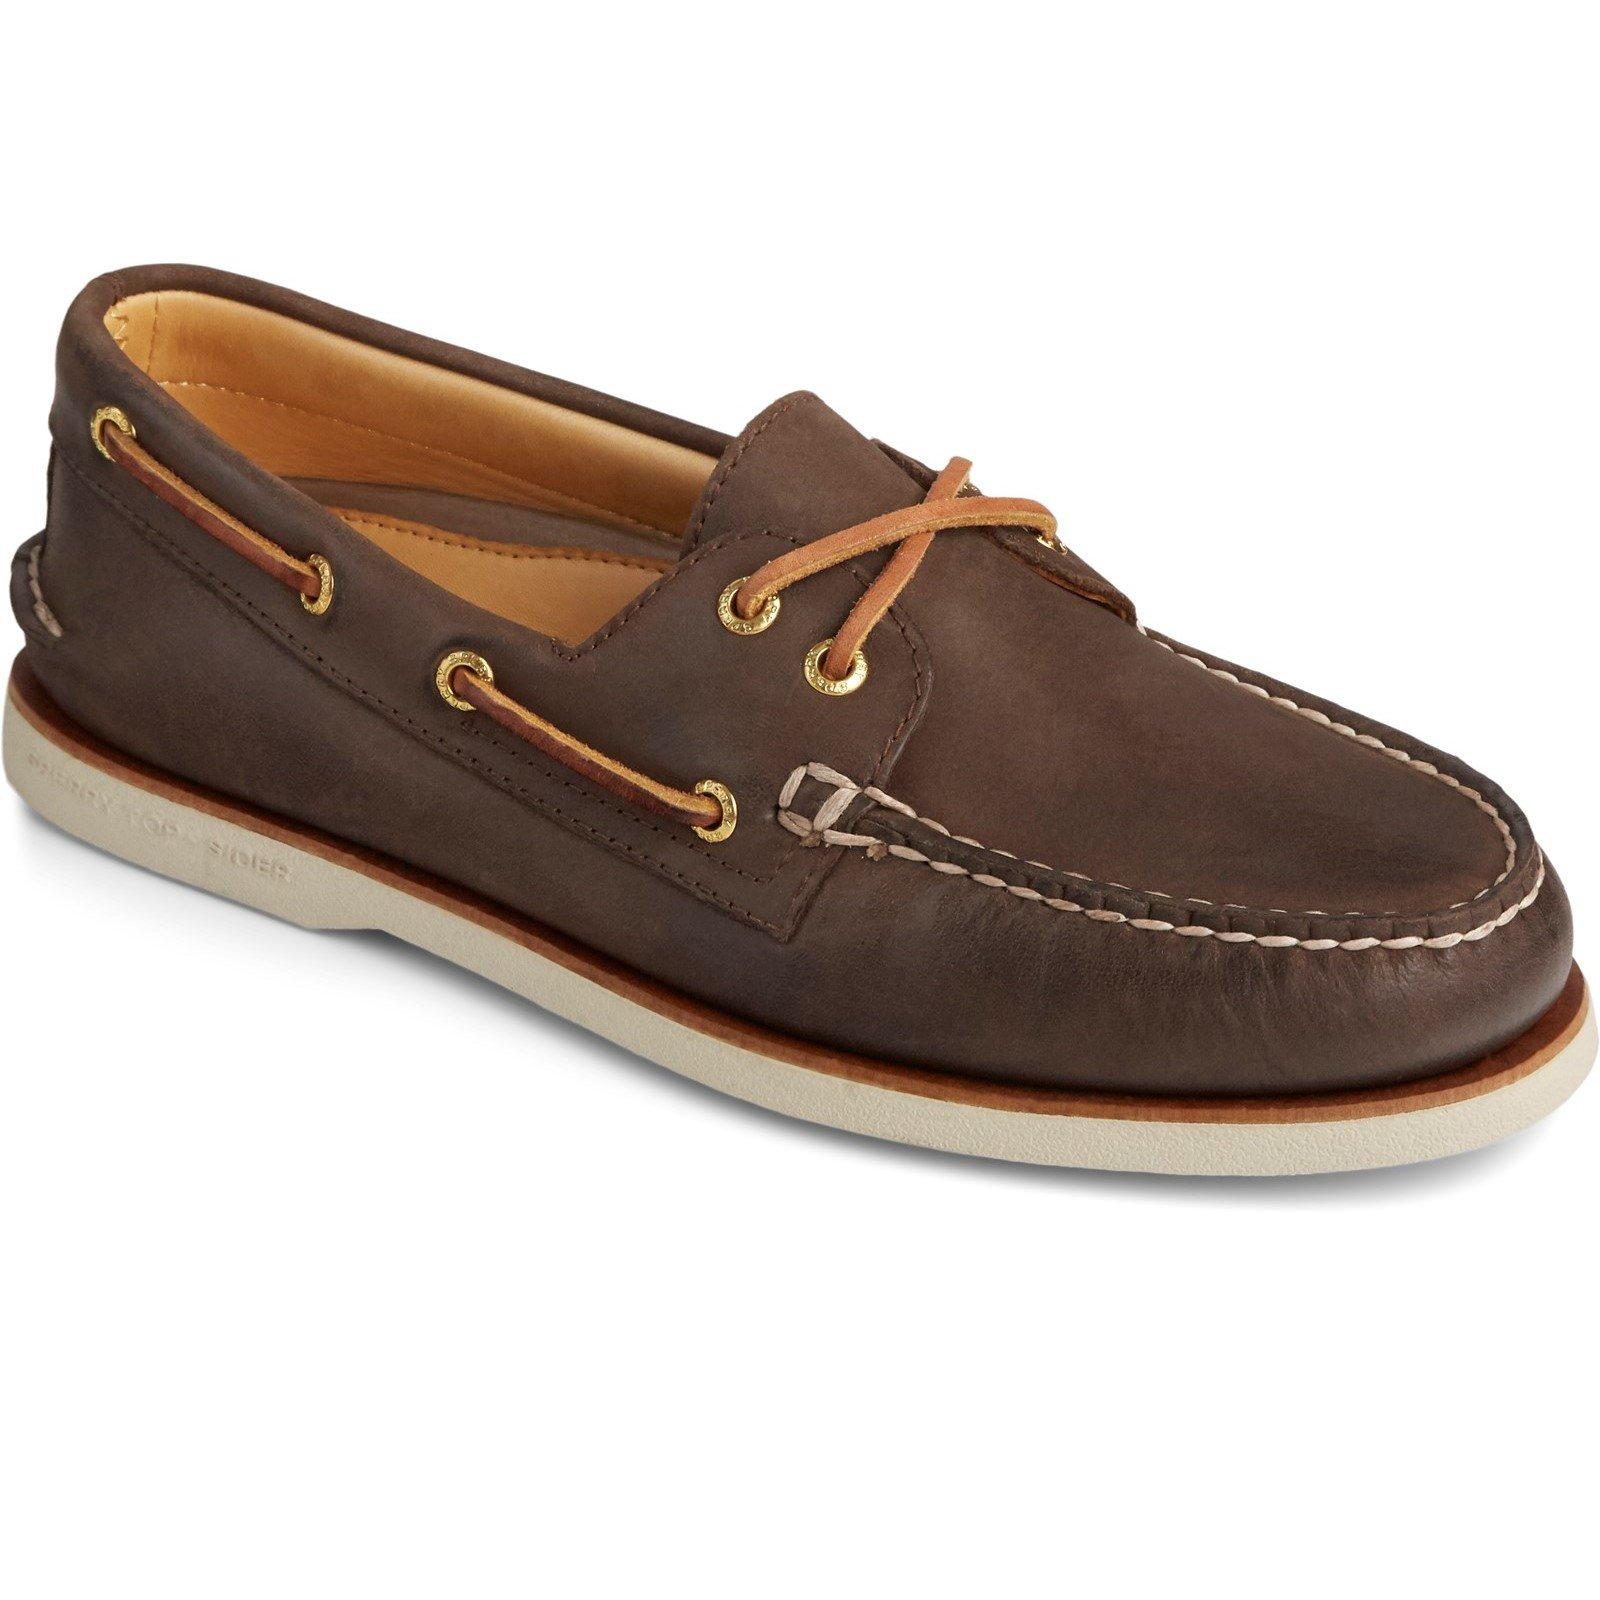 Sperry Men's Cup Authentic Original Boat Shoe Various Colours 31735 - Brown 13